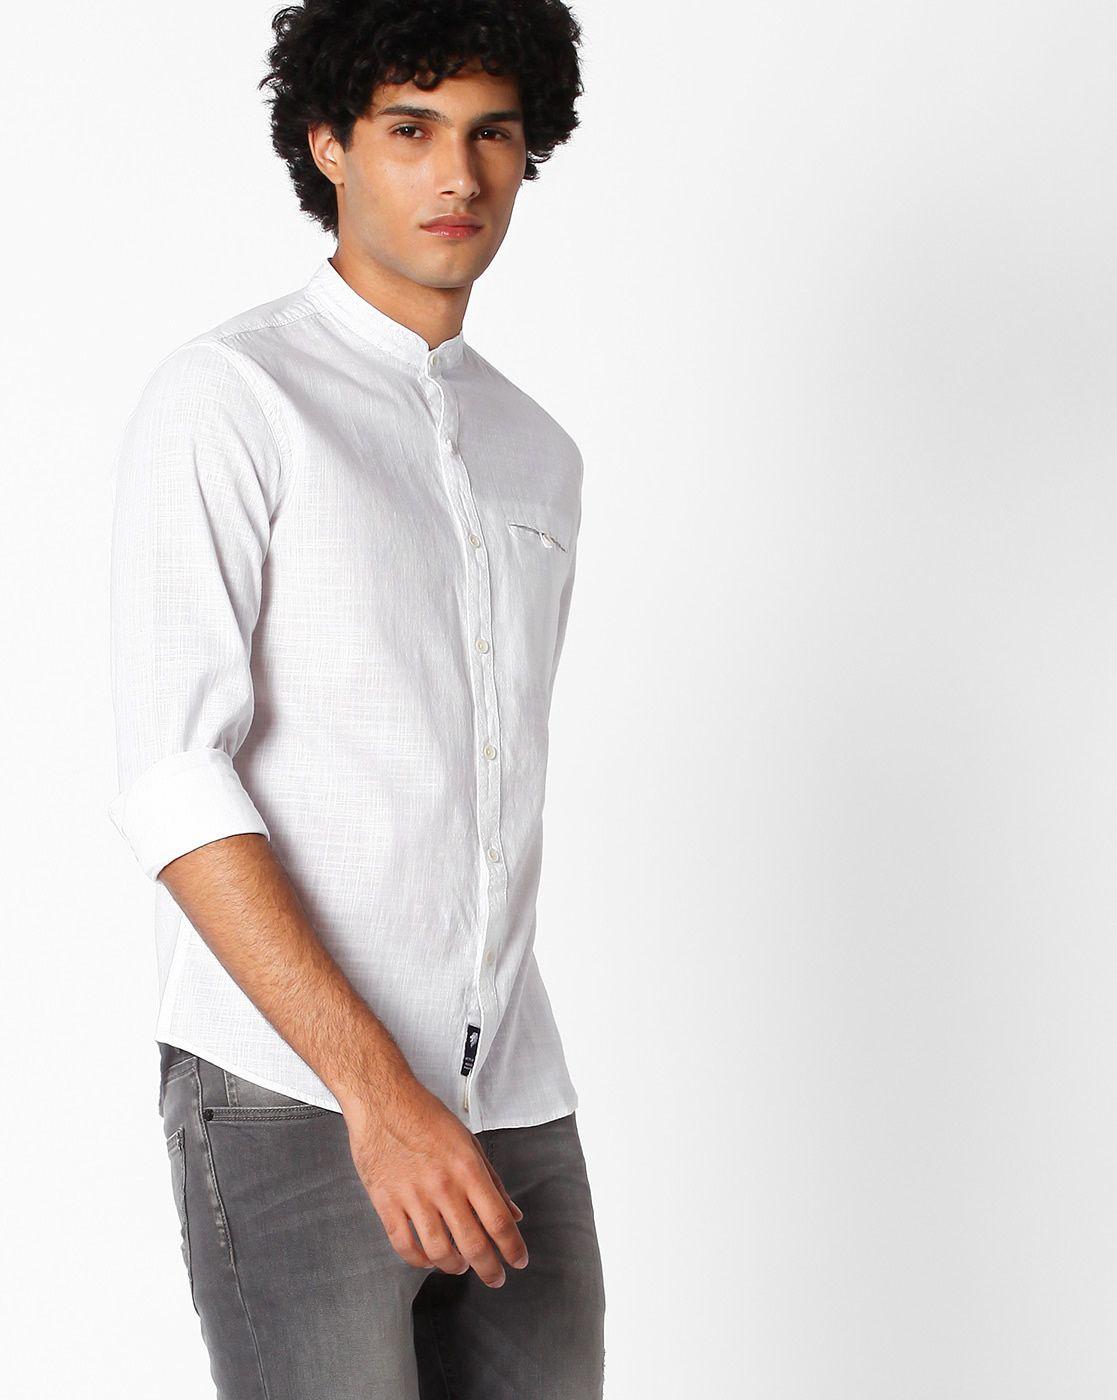 1275ba5627 Buy White NETPLAY Cotton Shirt with Band Collar | AJIO | Menshirts ...